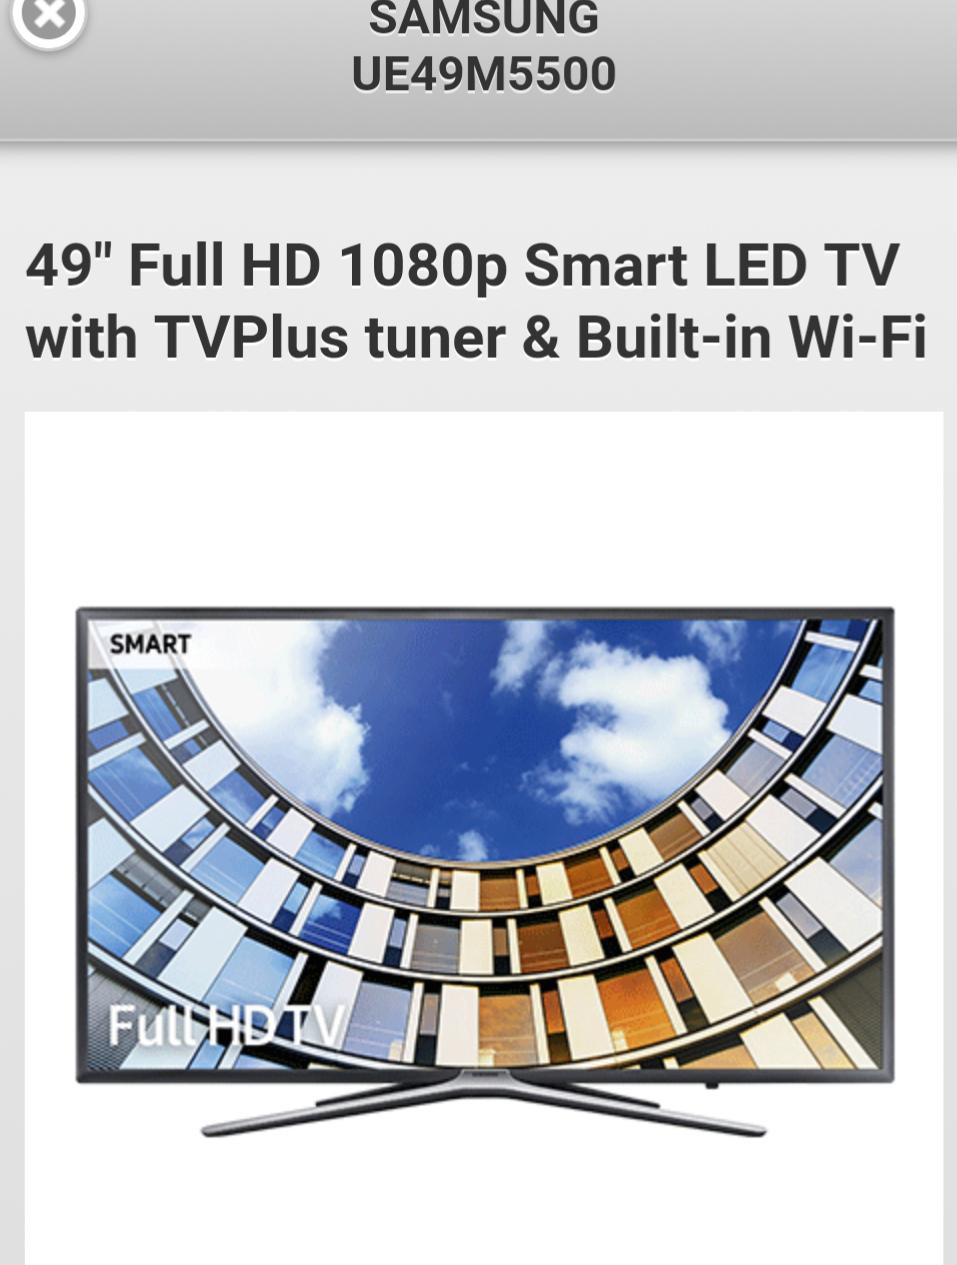 SAMSUNG UE49M5500 £399 @ RGB direct